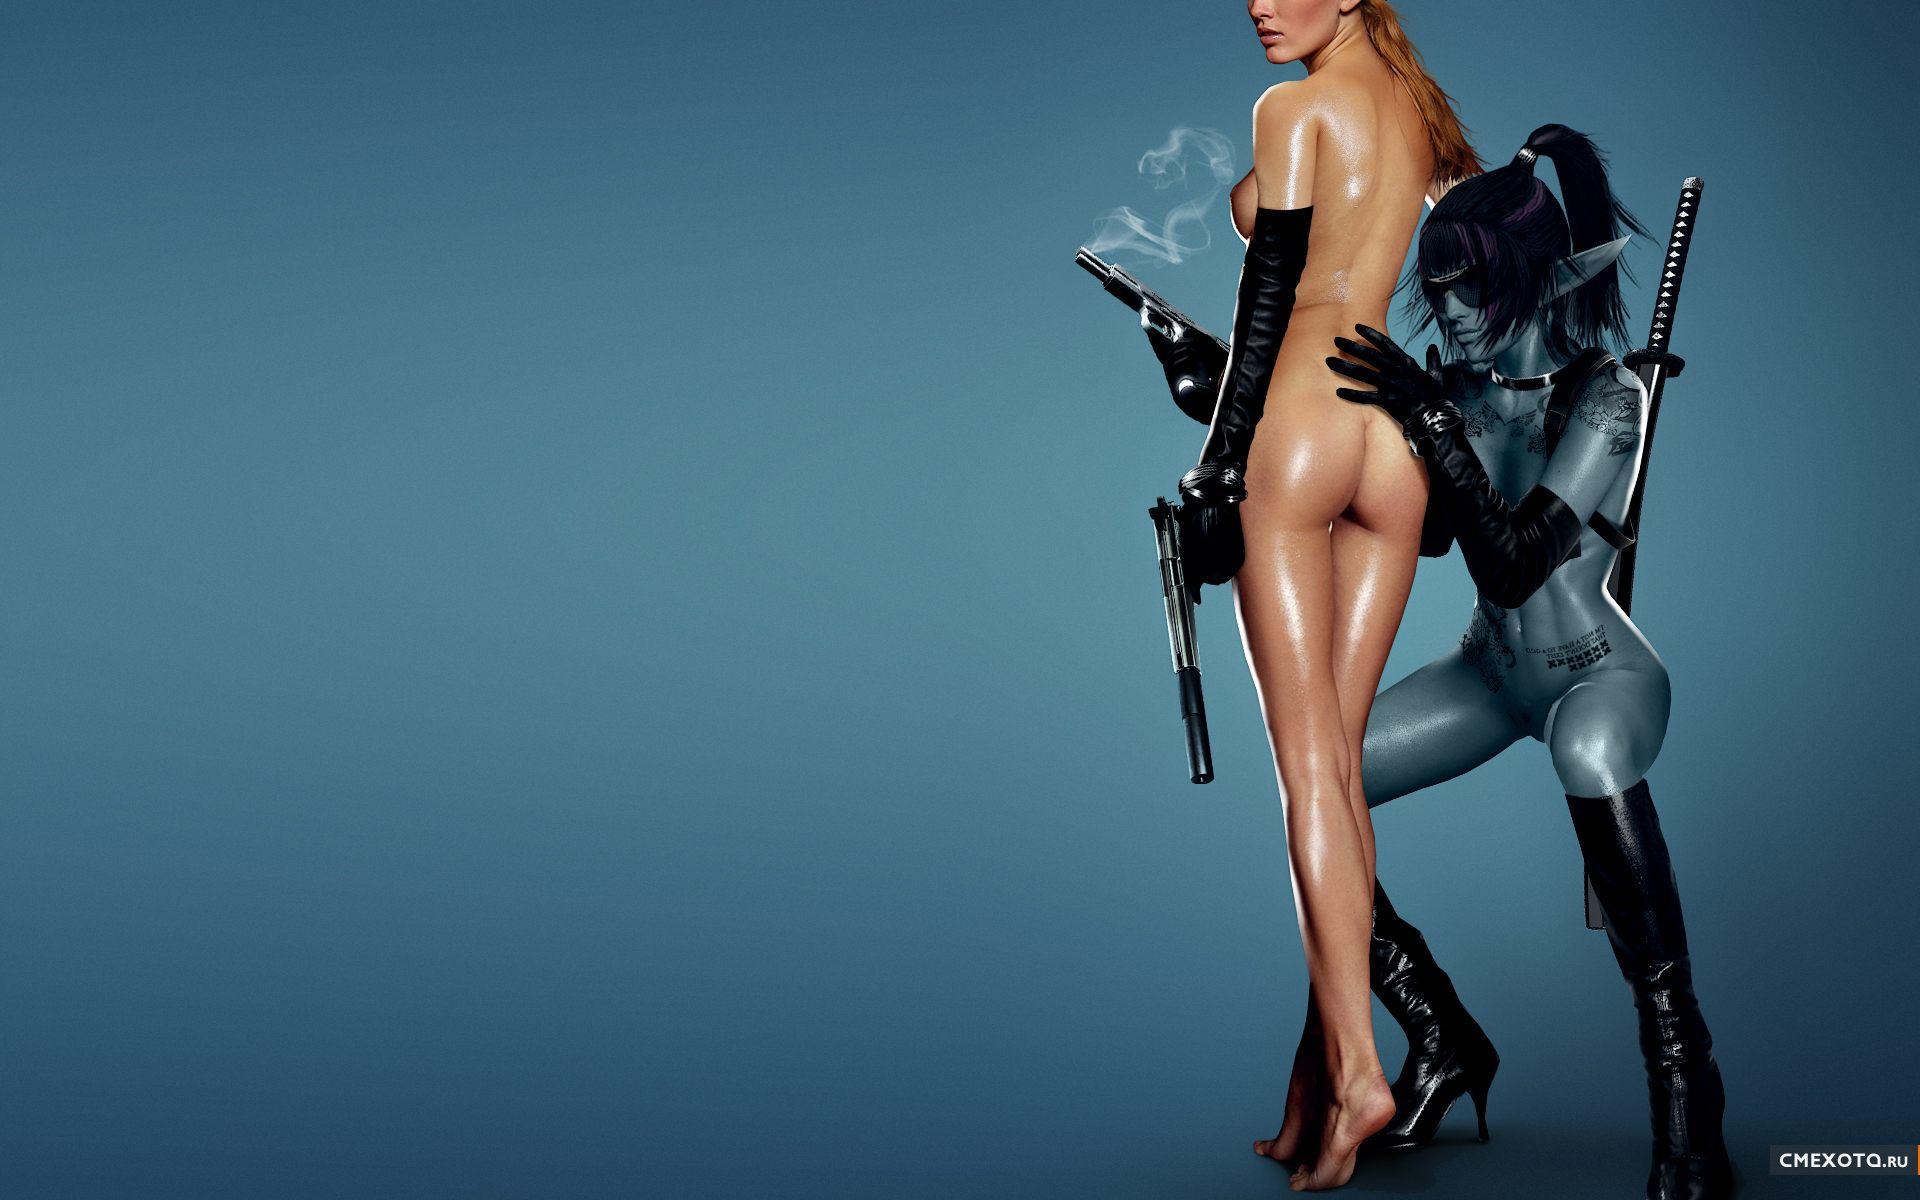 Девушки оружие эротика фото фото 504-579